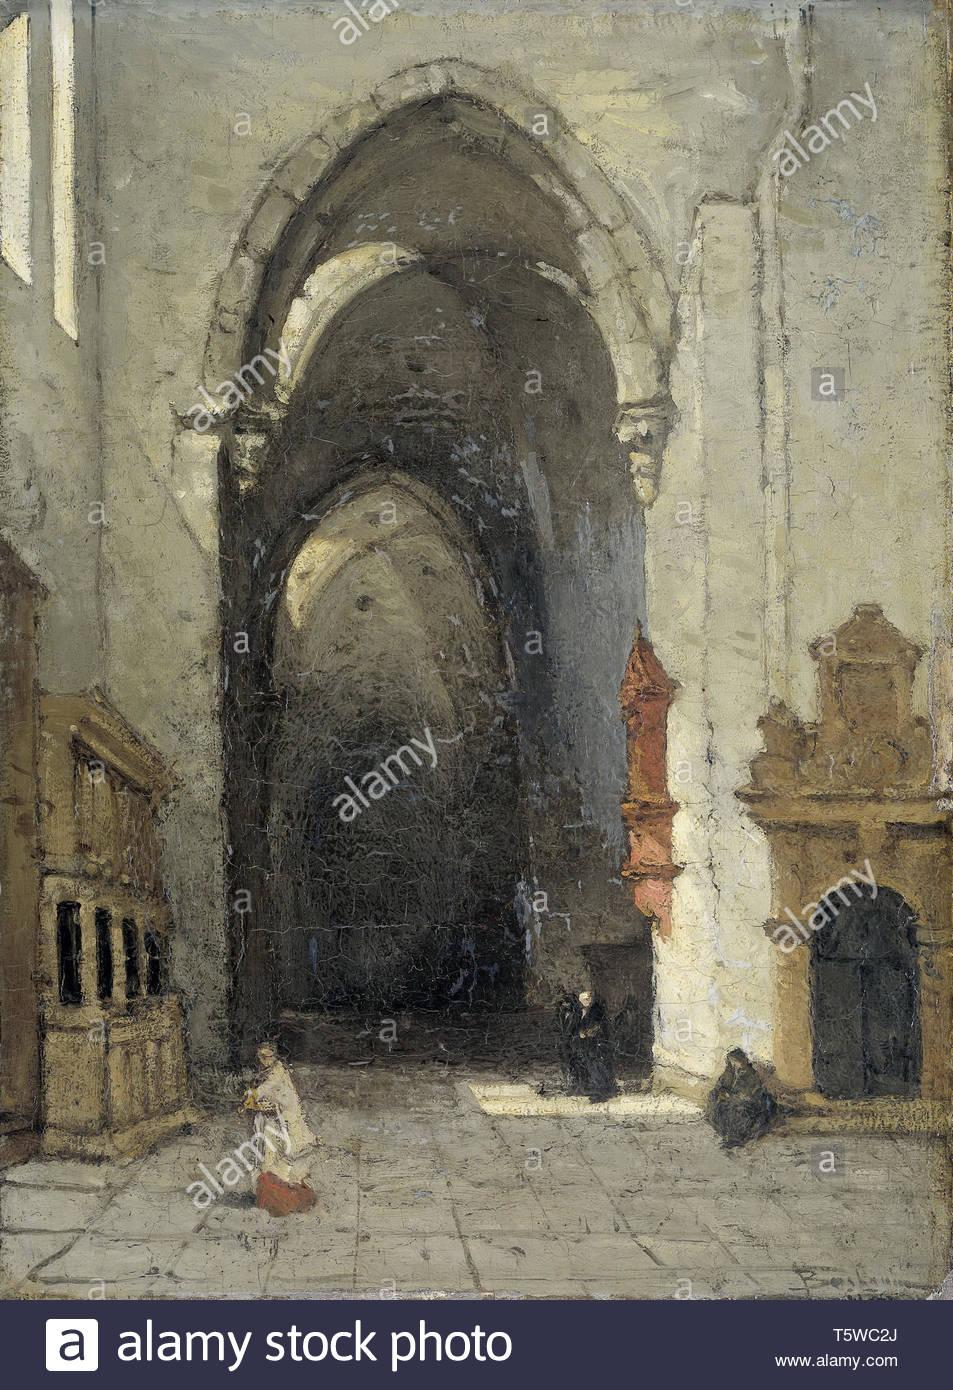 Bosboom, Johannes-Interieur van de Domkerk te Trier, 1870-1880 Stockbild